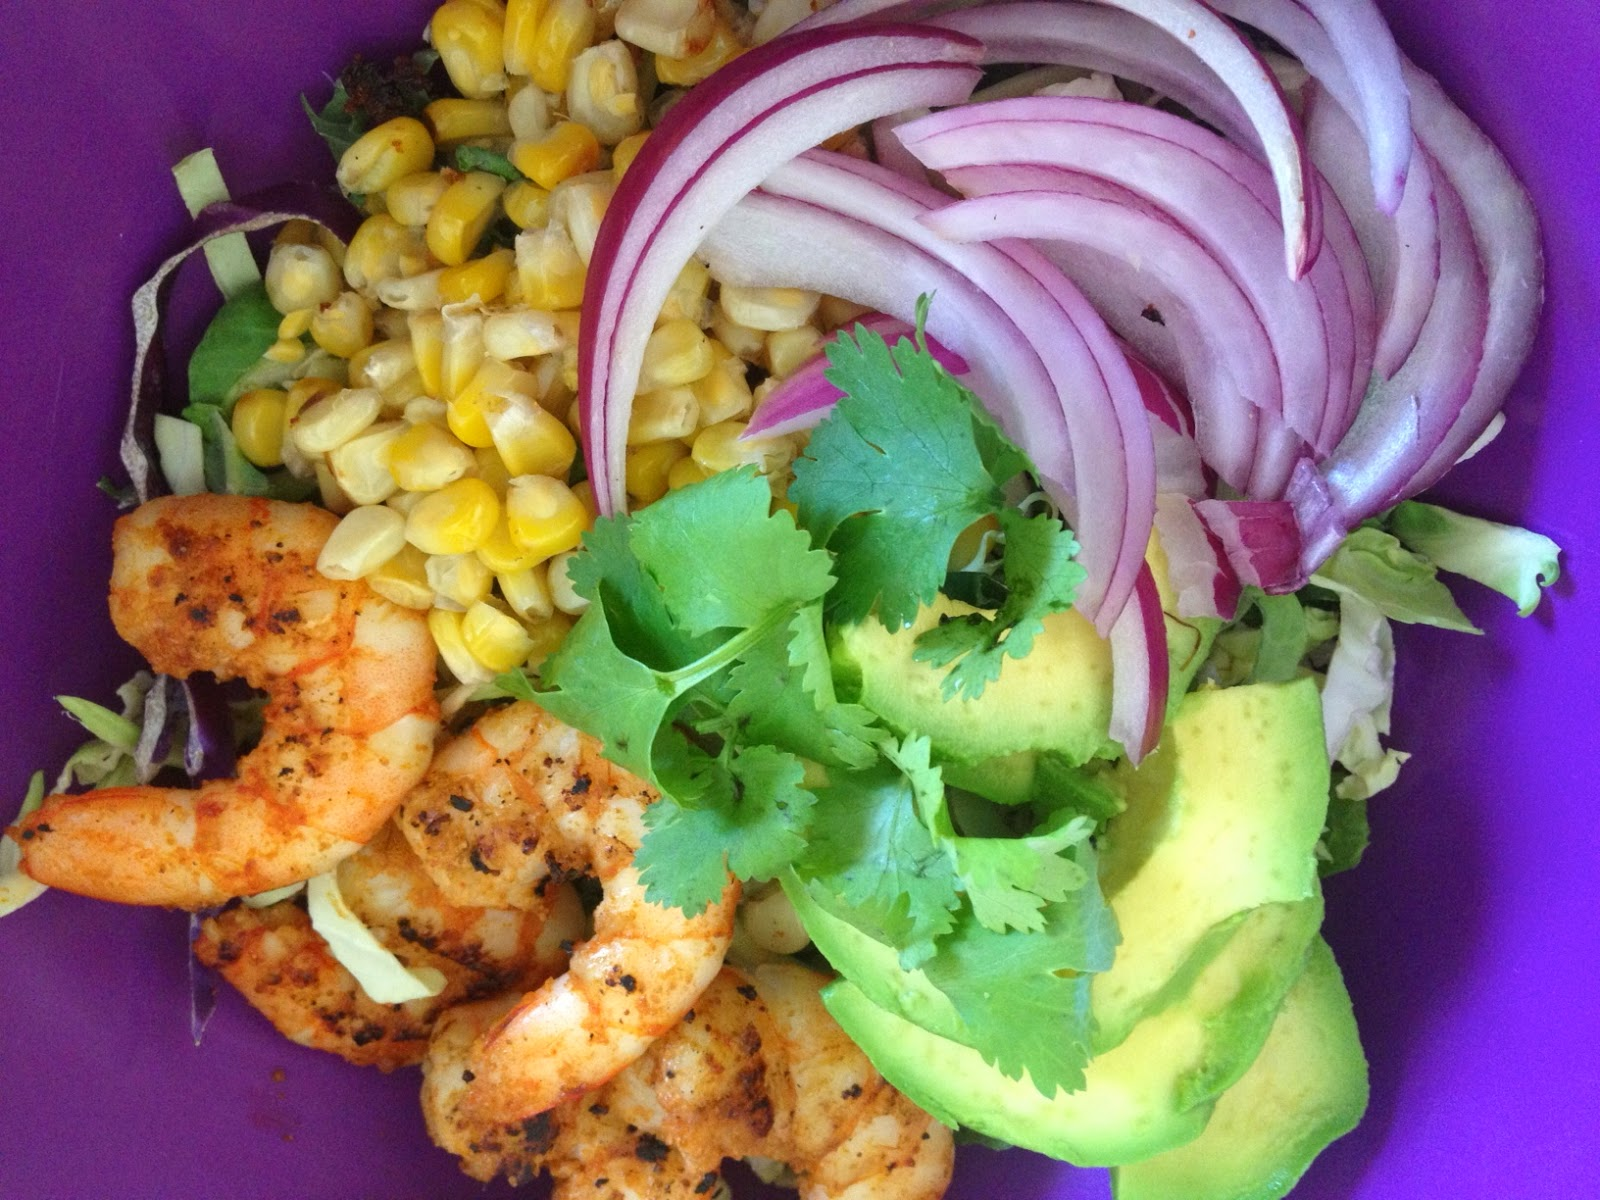 Avis: Shrimp, corn salad with lime cilantro dressing